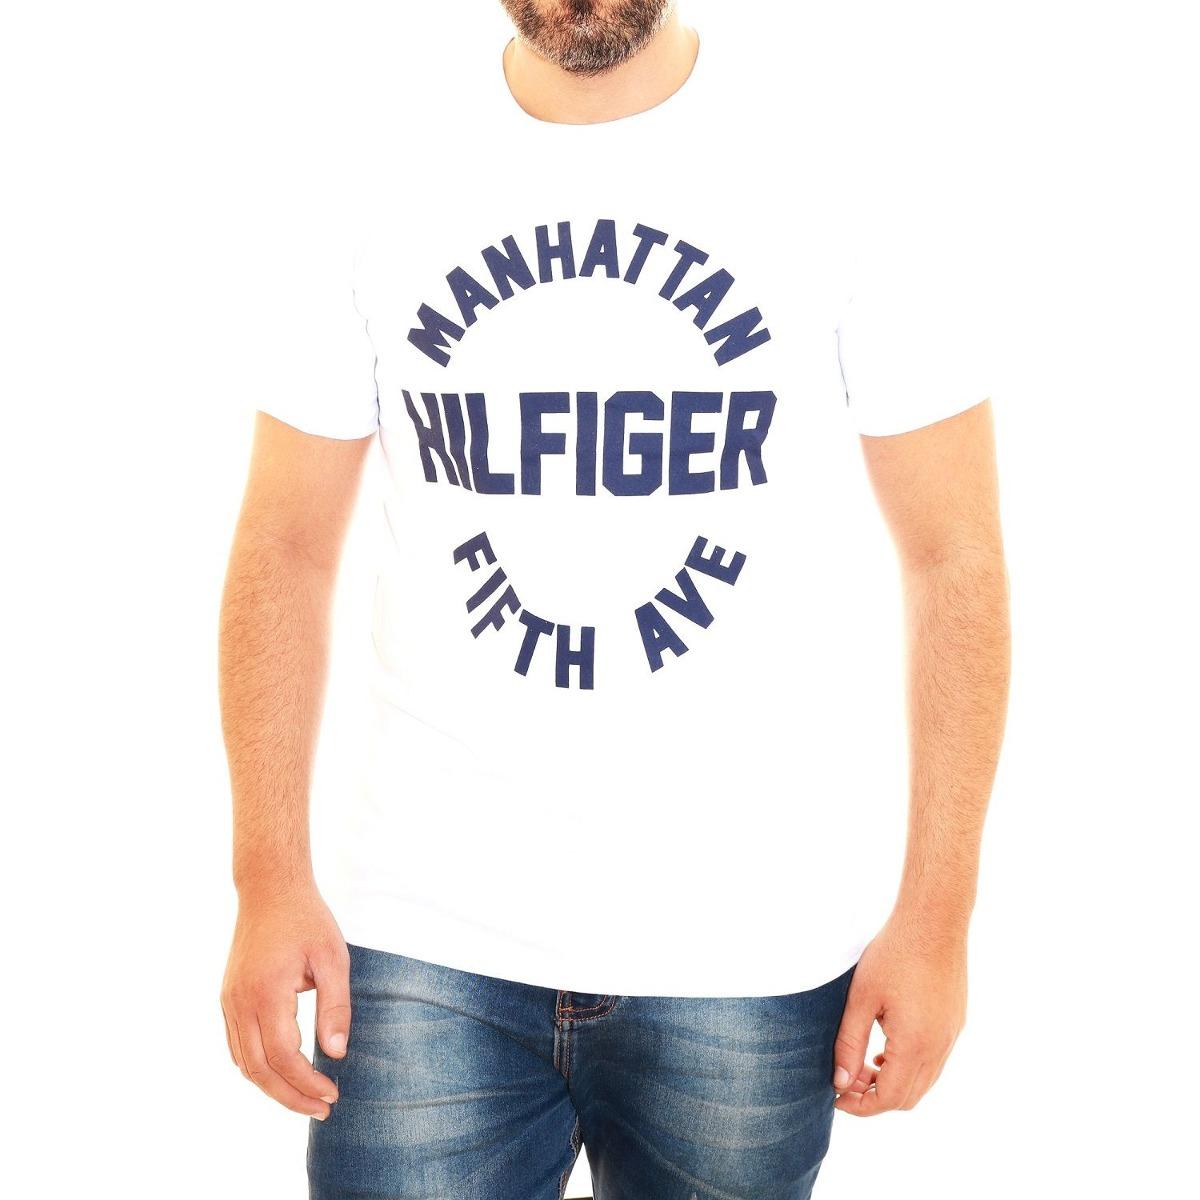 29d3a0454 camisa camiseta tommy hilfiger masculina manhattan branco. Carregando zoom.